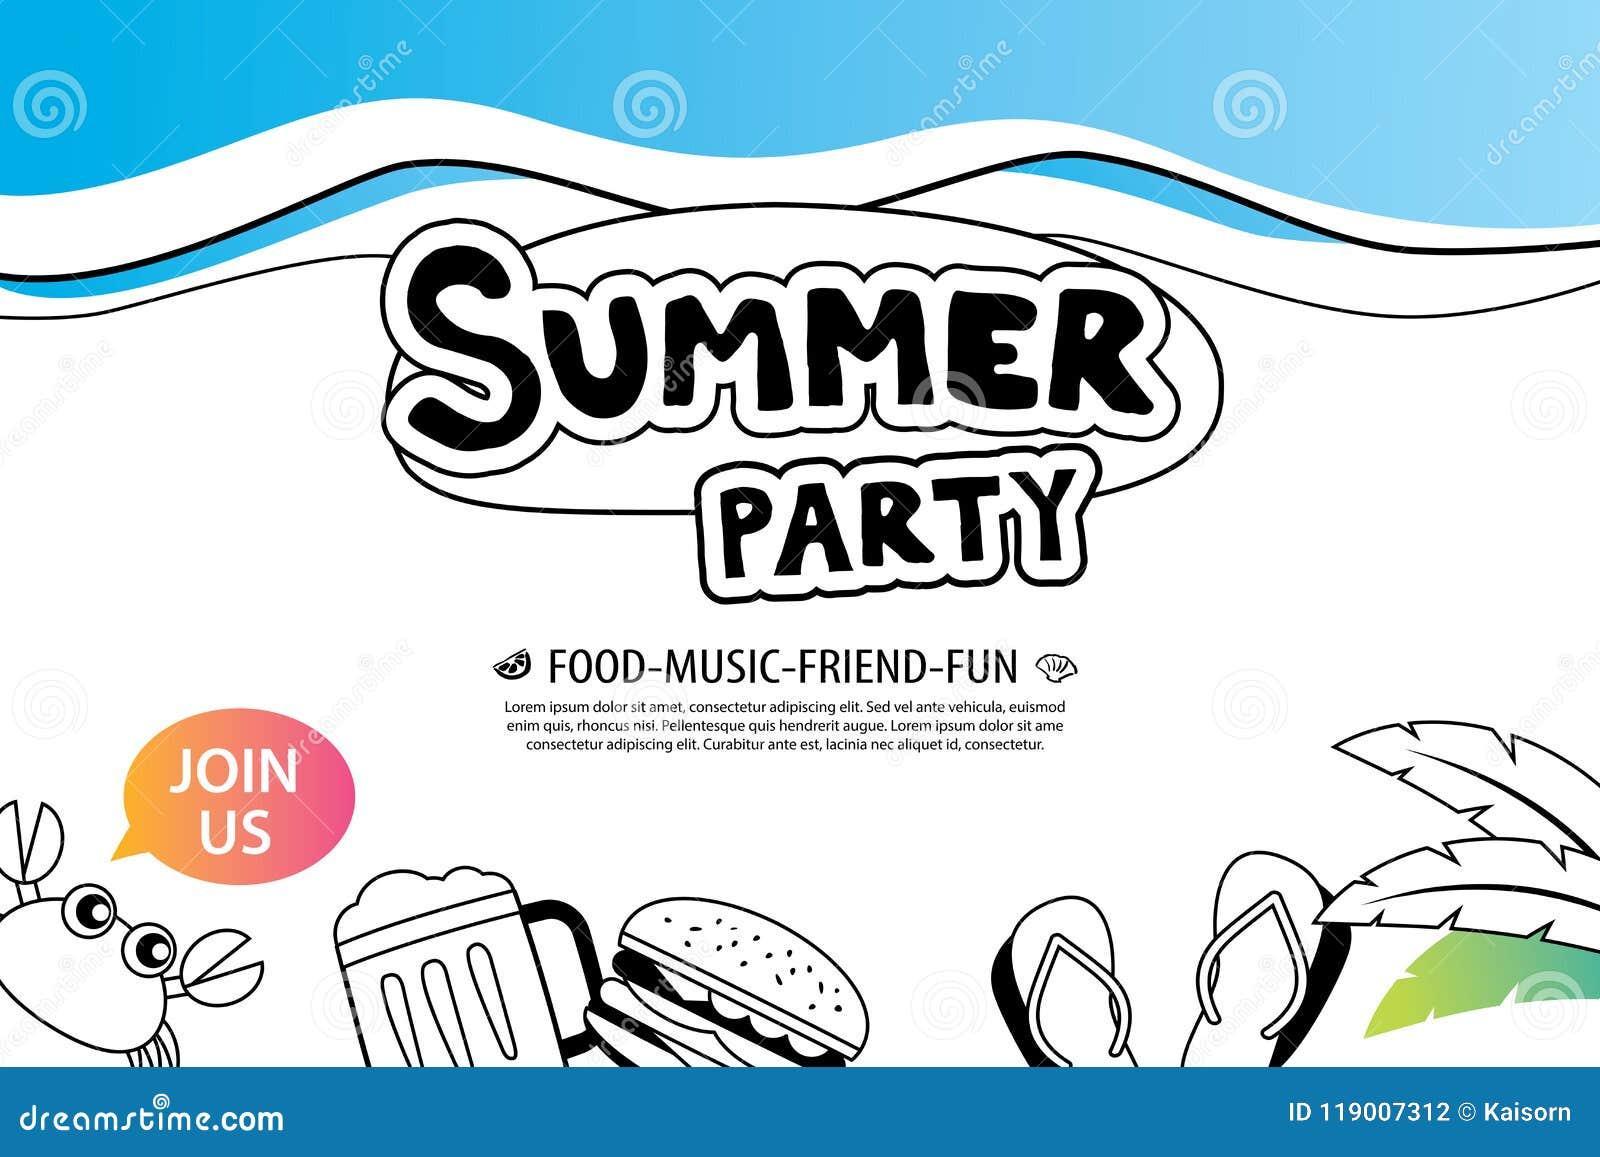 Perfect Summer Party Invitations Ideas - Invitations Design ...